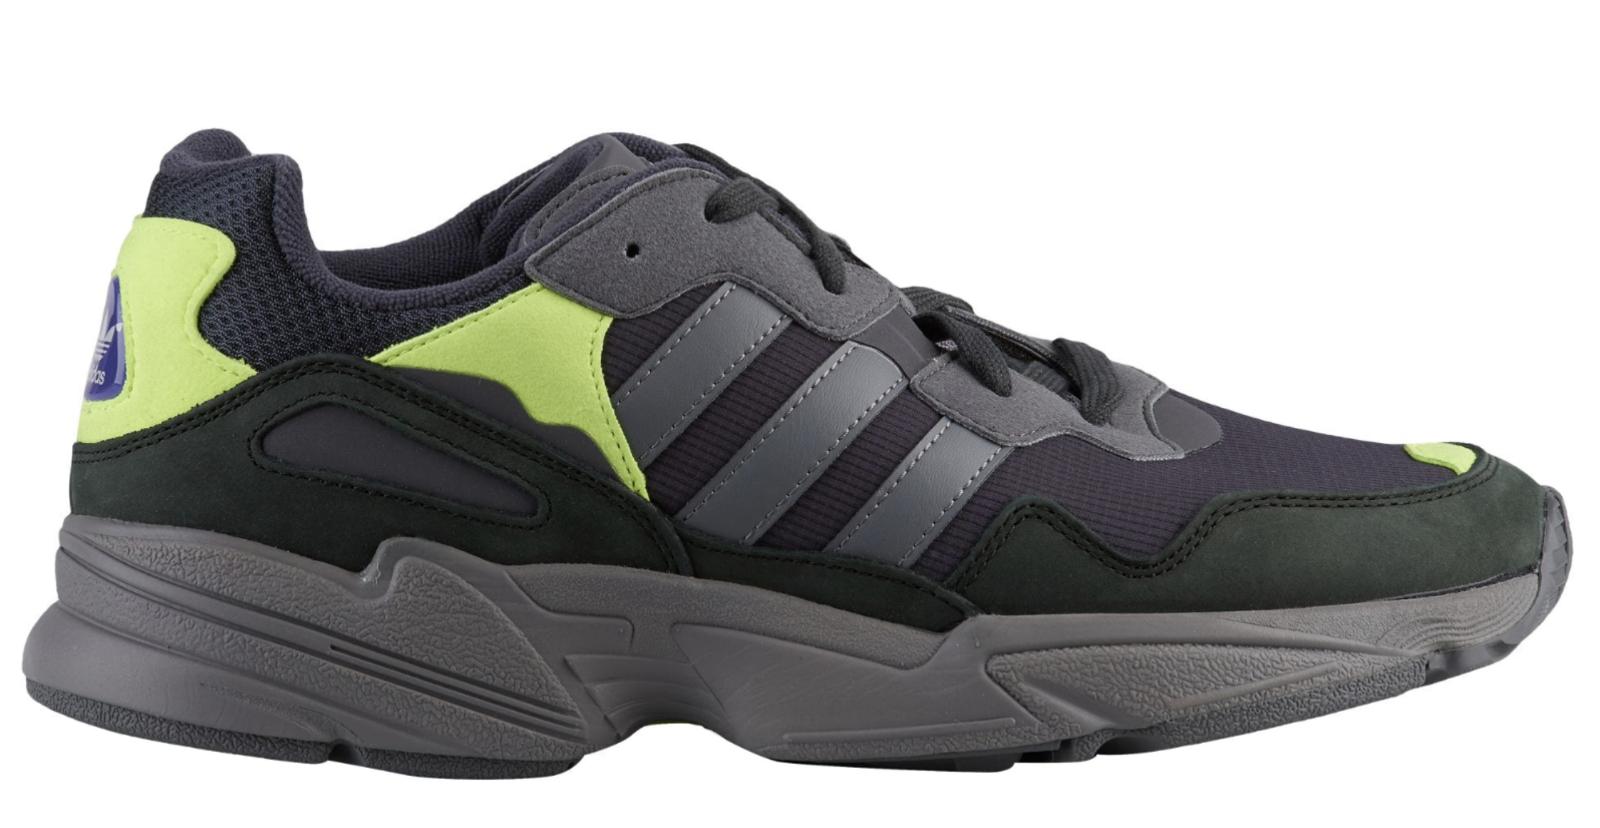 Herren Adidas YUNG-96 Kohlen Turnschuhe F97180